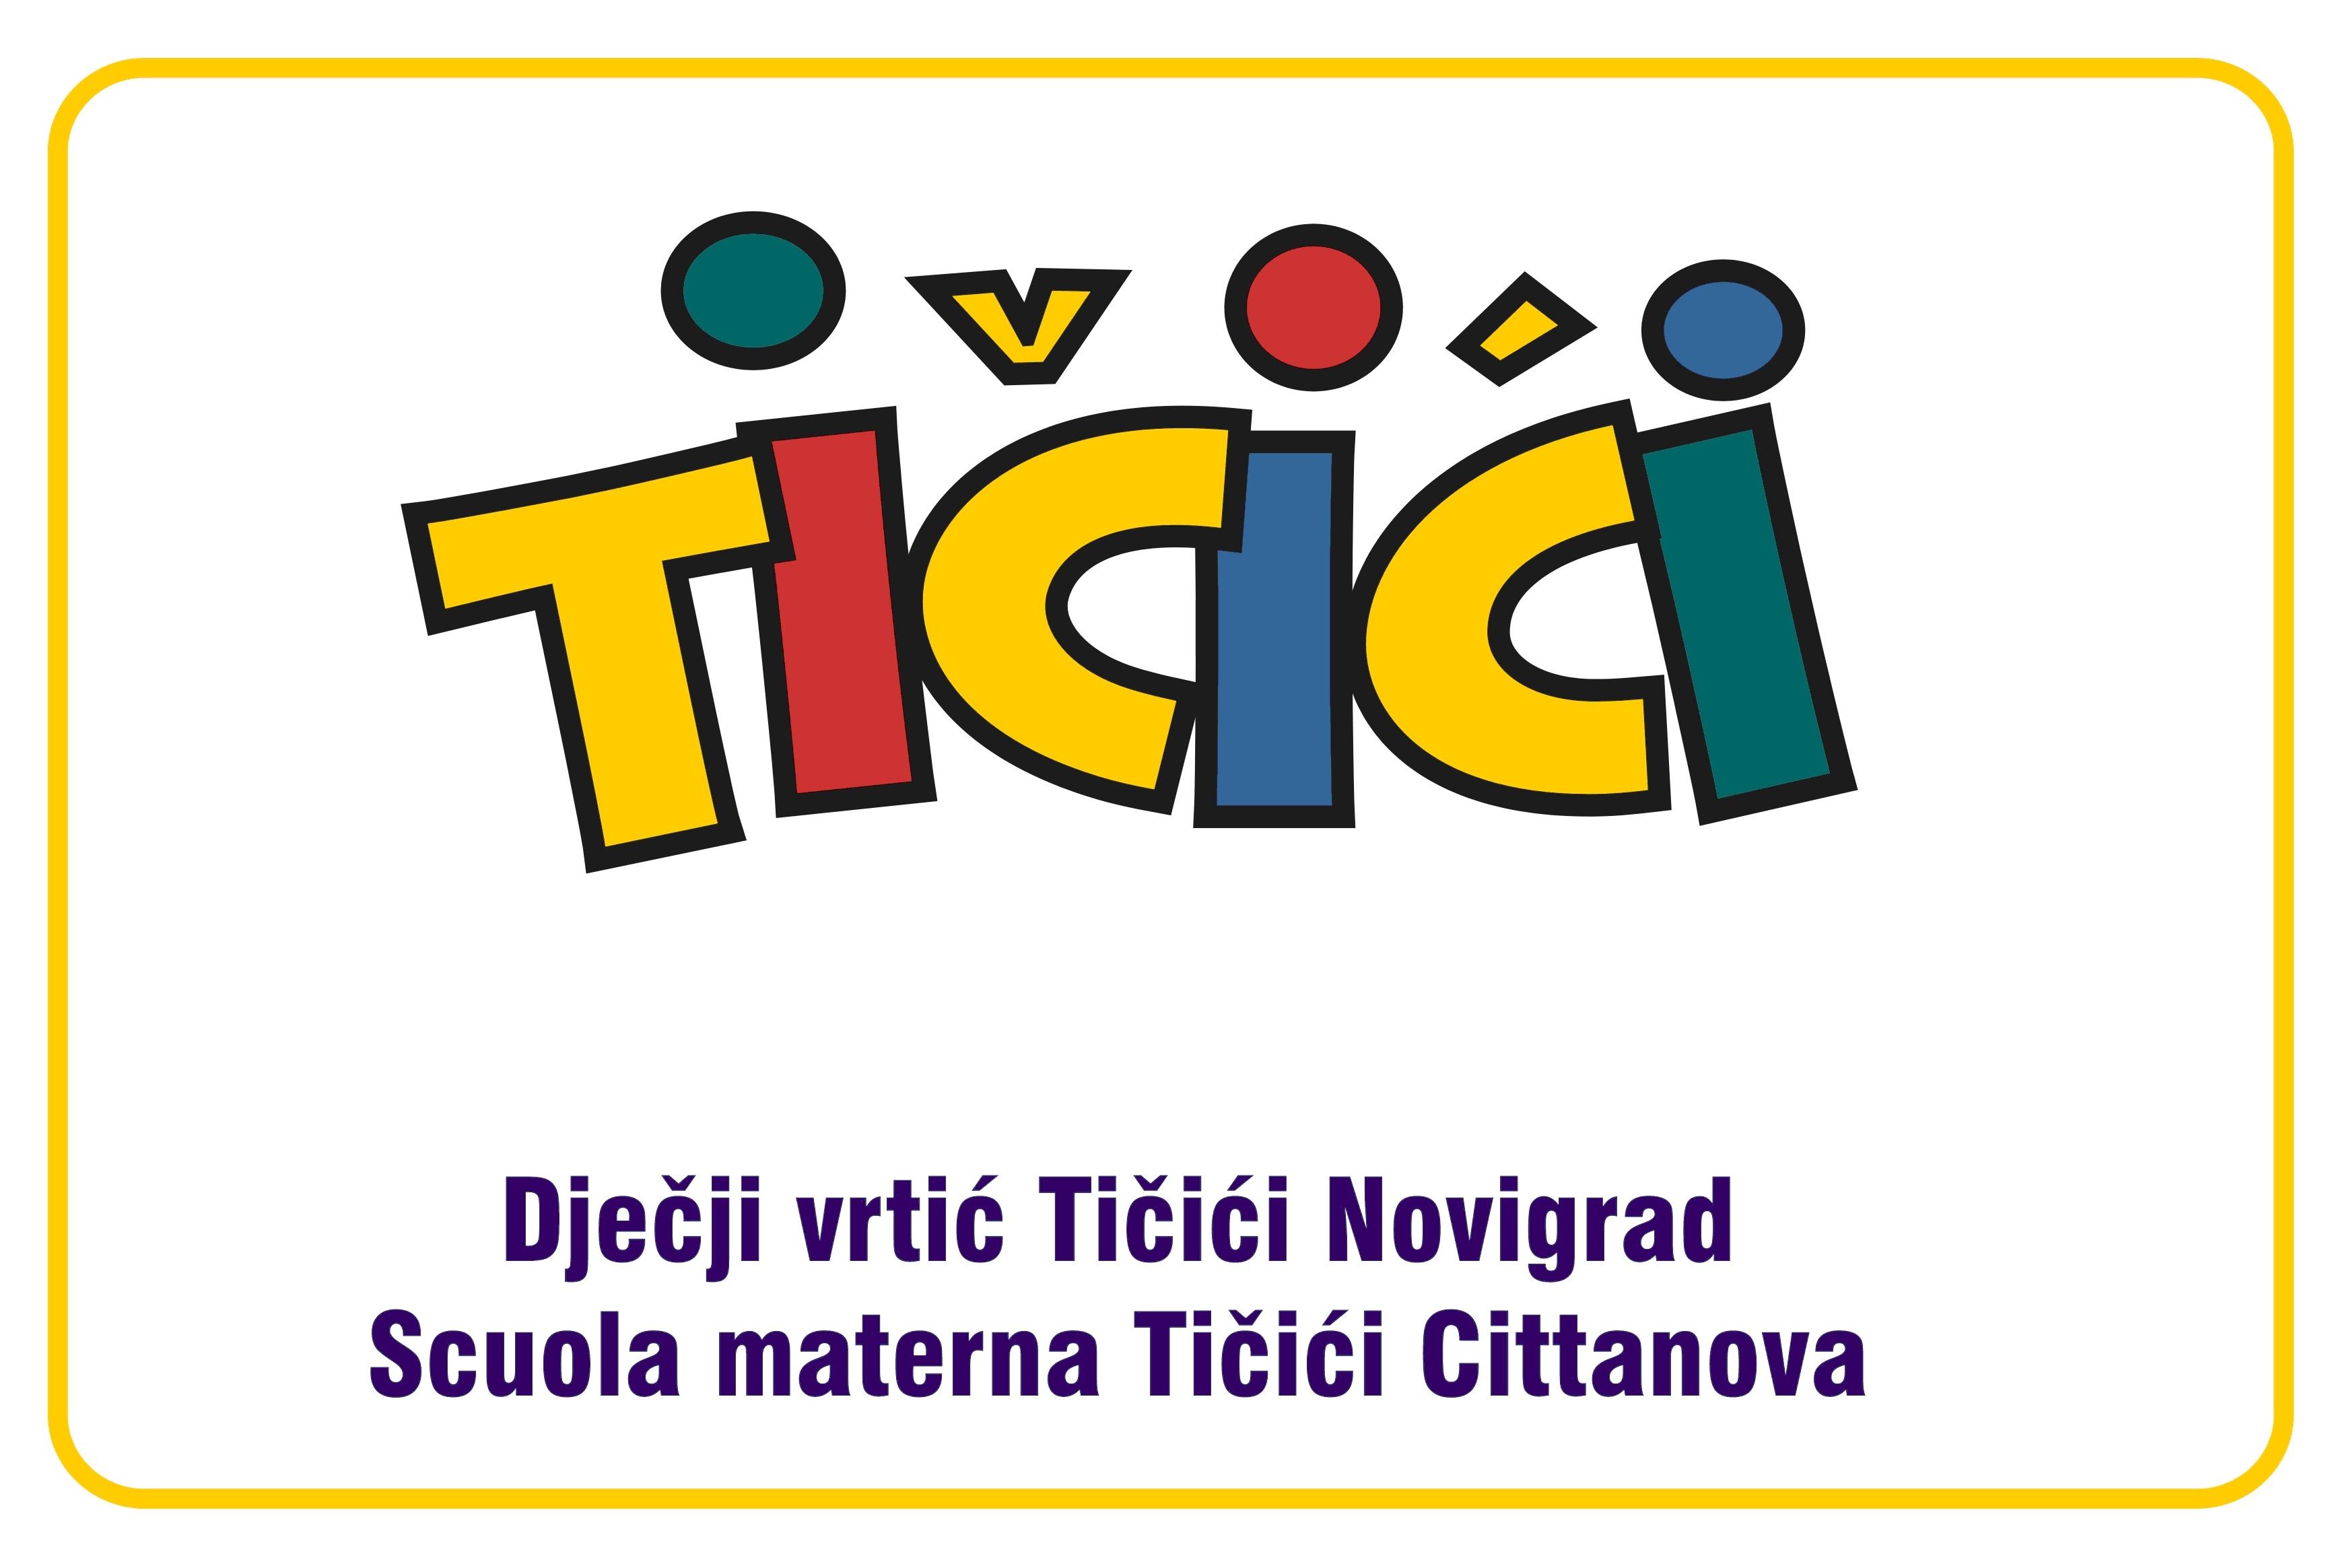 http://www.novigrad.hr/zavrshna_priredba_djechjeg_vrtia_tichii